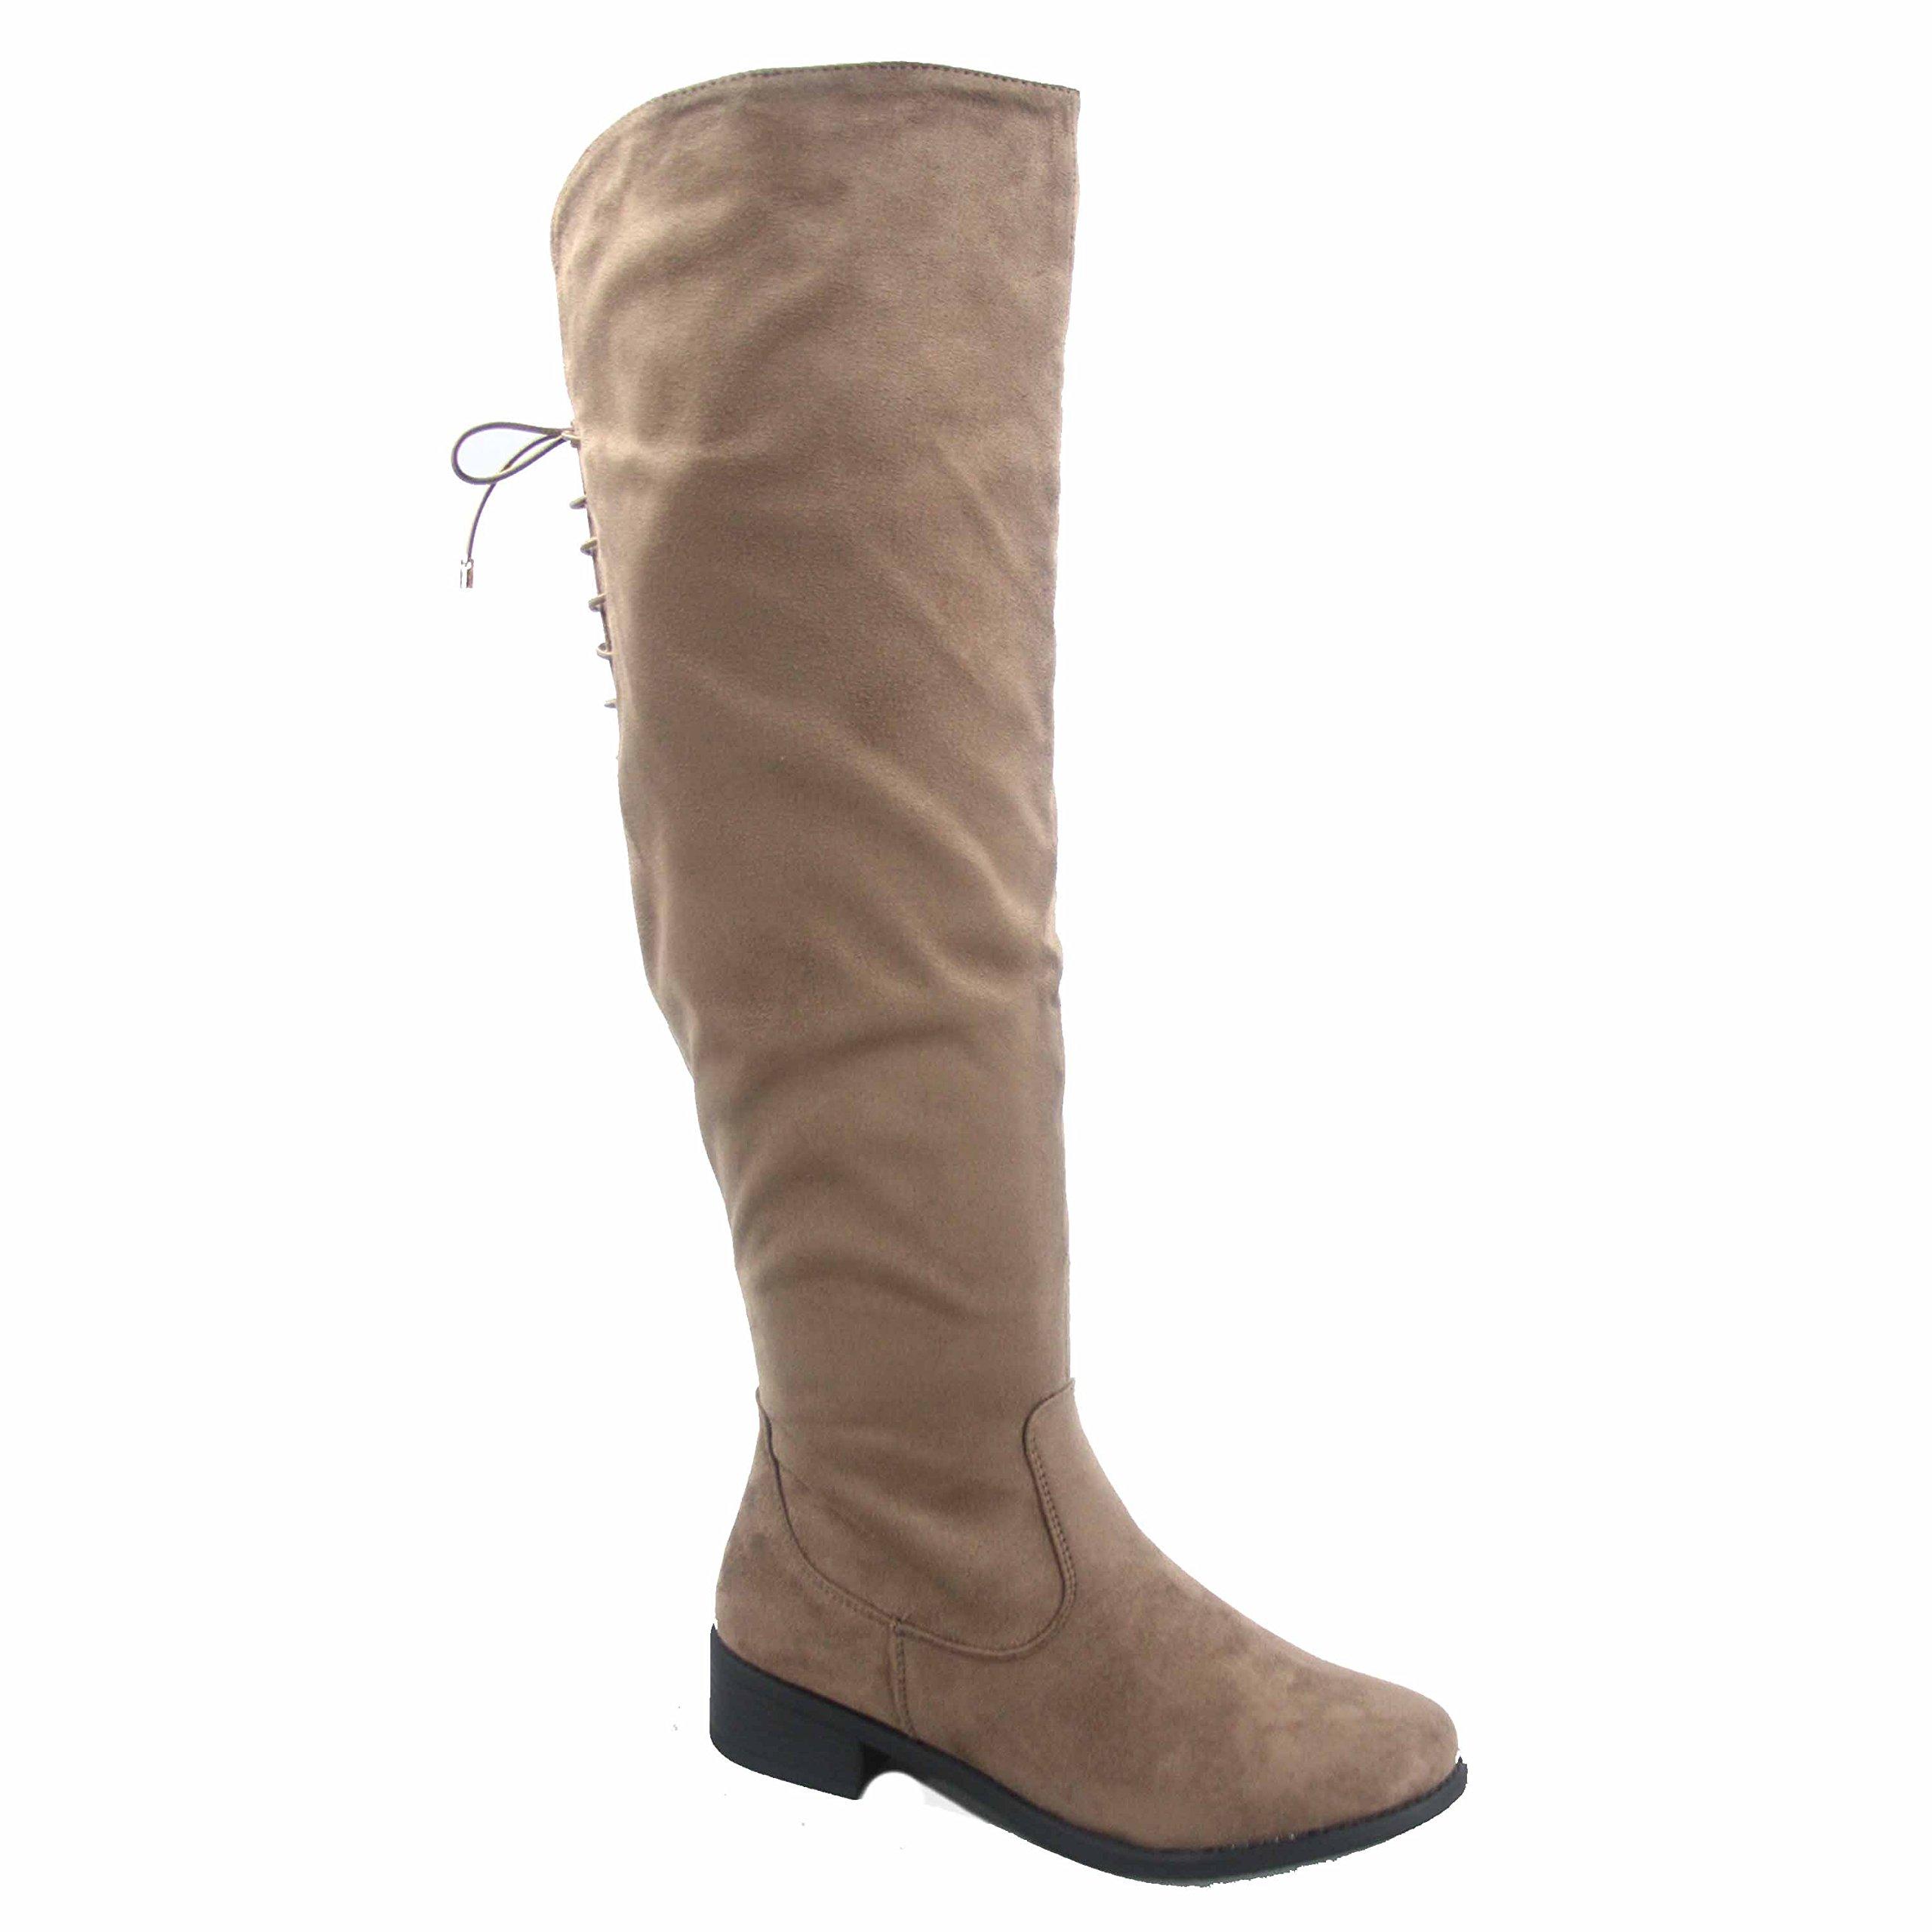 Top Moda Jones-6 Women's Round Toe Low Heel Zipper Over The Knee Riding Boots Shoes (7.5, Taupe)